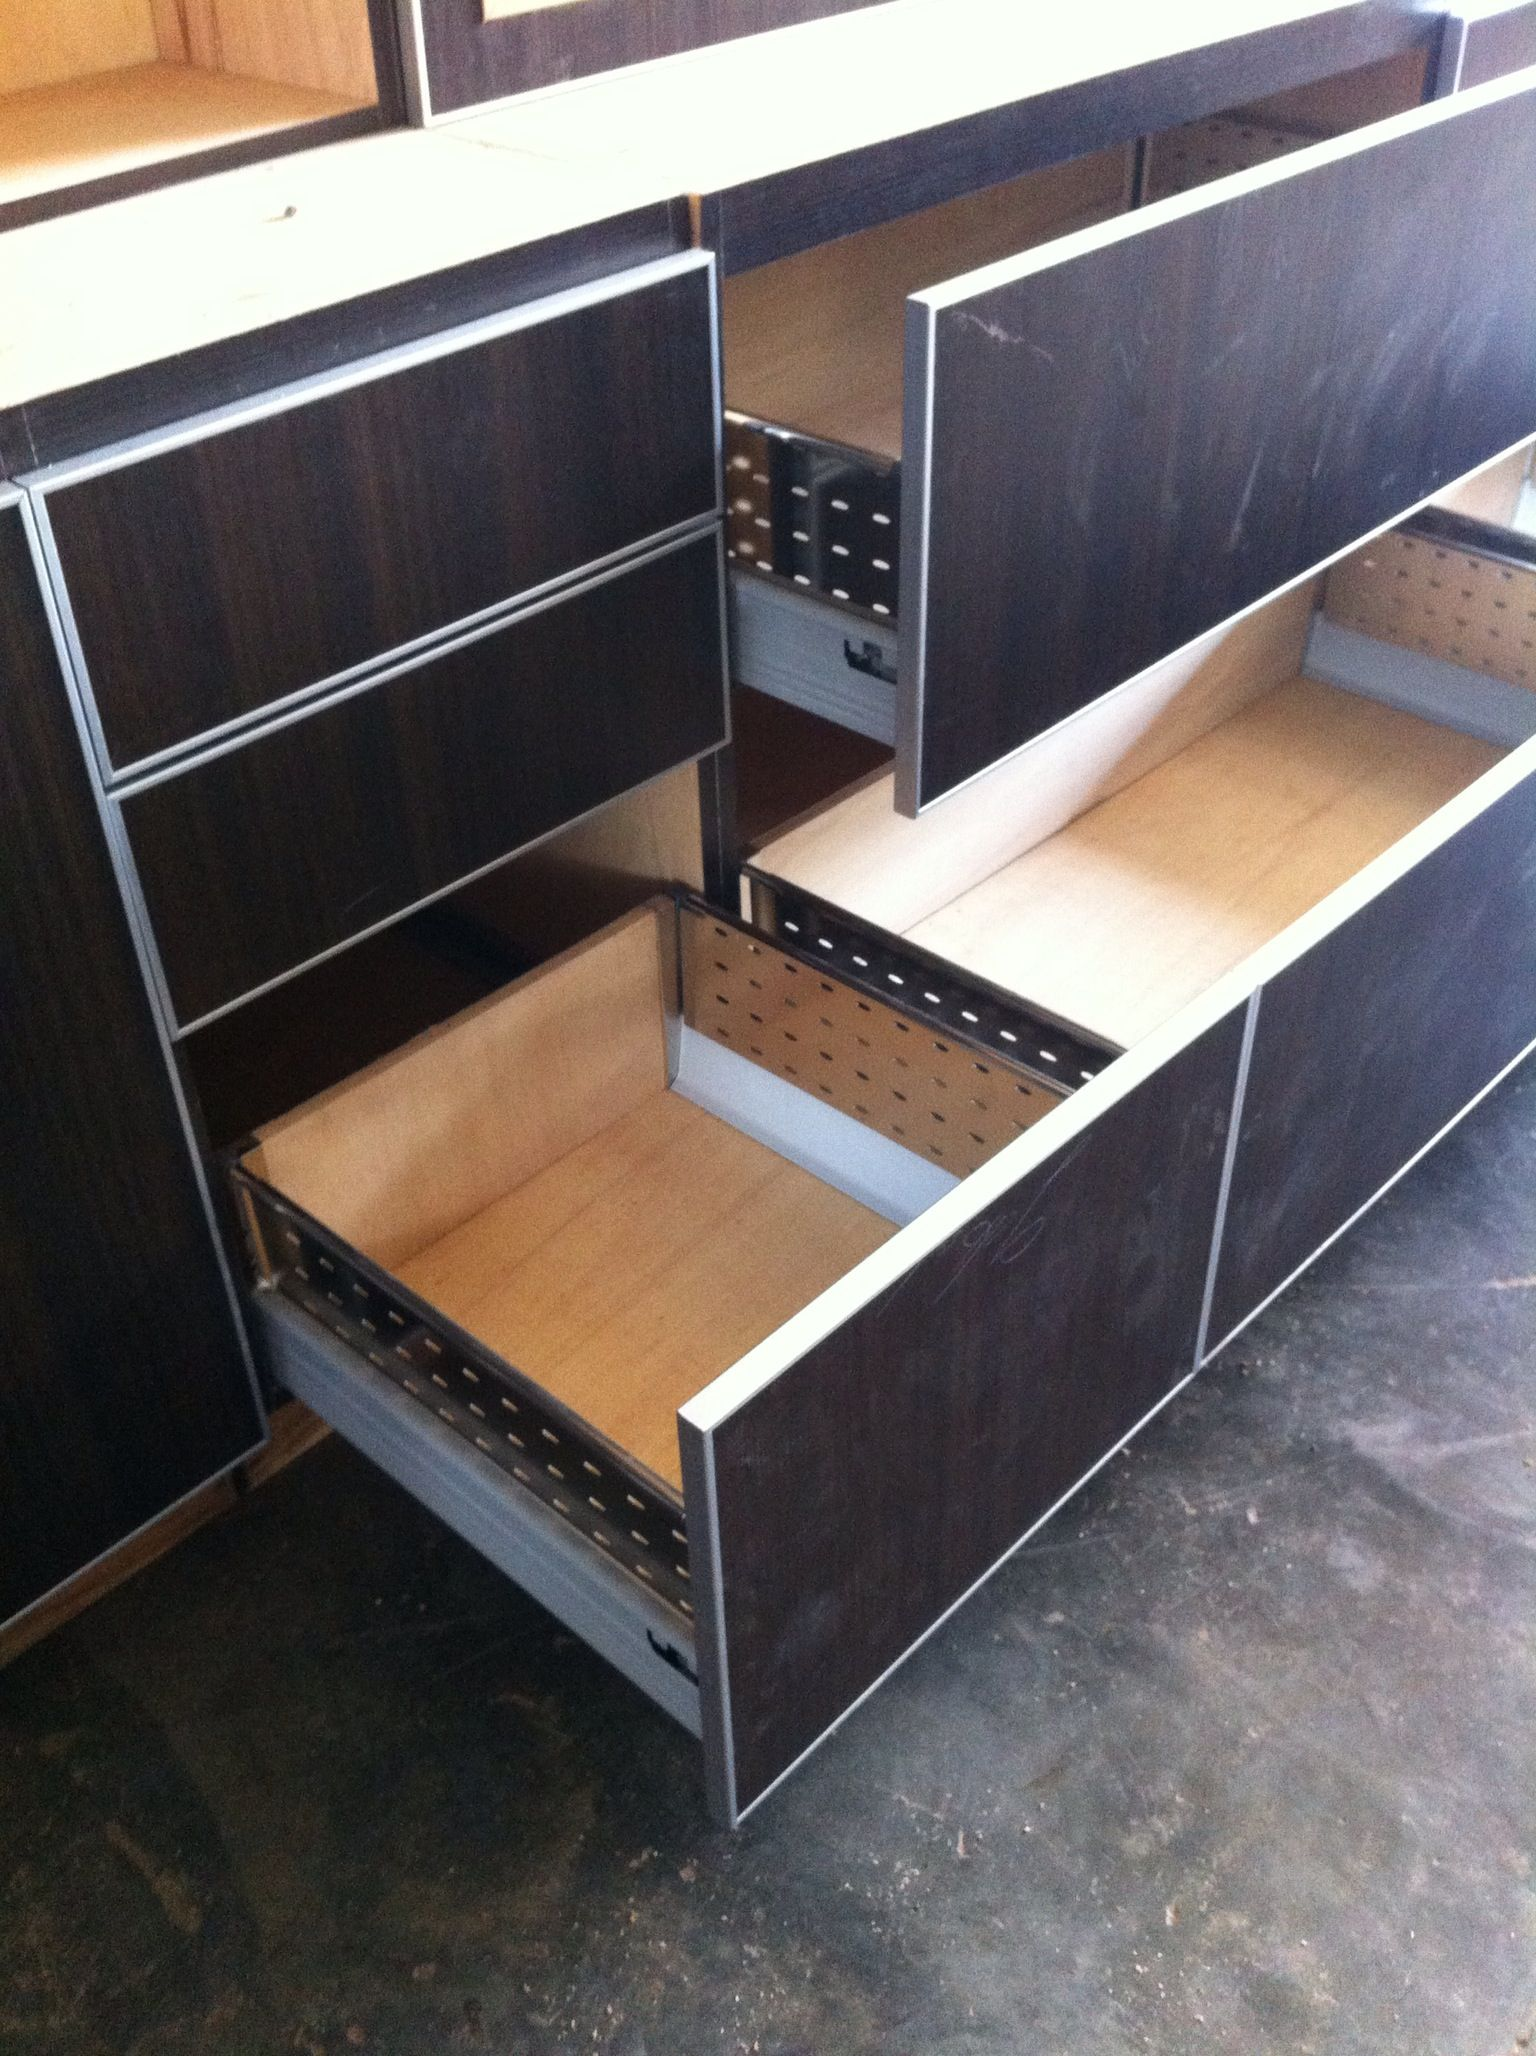 Muebles de cocina accesorios cocinas pinterest - Accesorios muebles de cocina ...